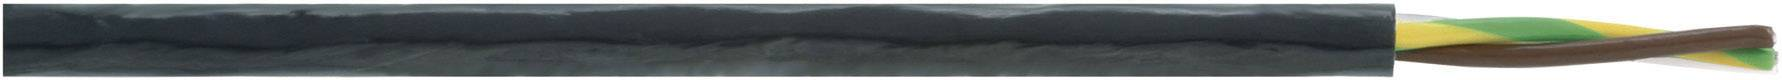 Vysokoteplotné vedenie LappKabel ÖLFLEX® HEAT 260 MC 0091305, 2 x 0.75 mm², vonkajší Ø 4.20 mm, 500 V, metrový tovar, čierna